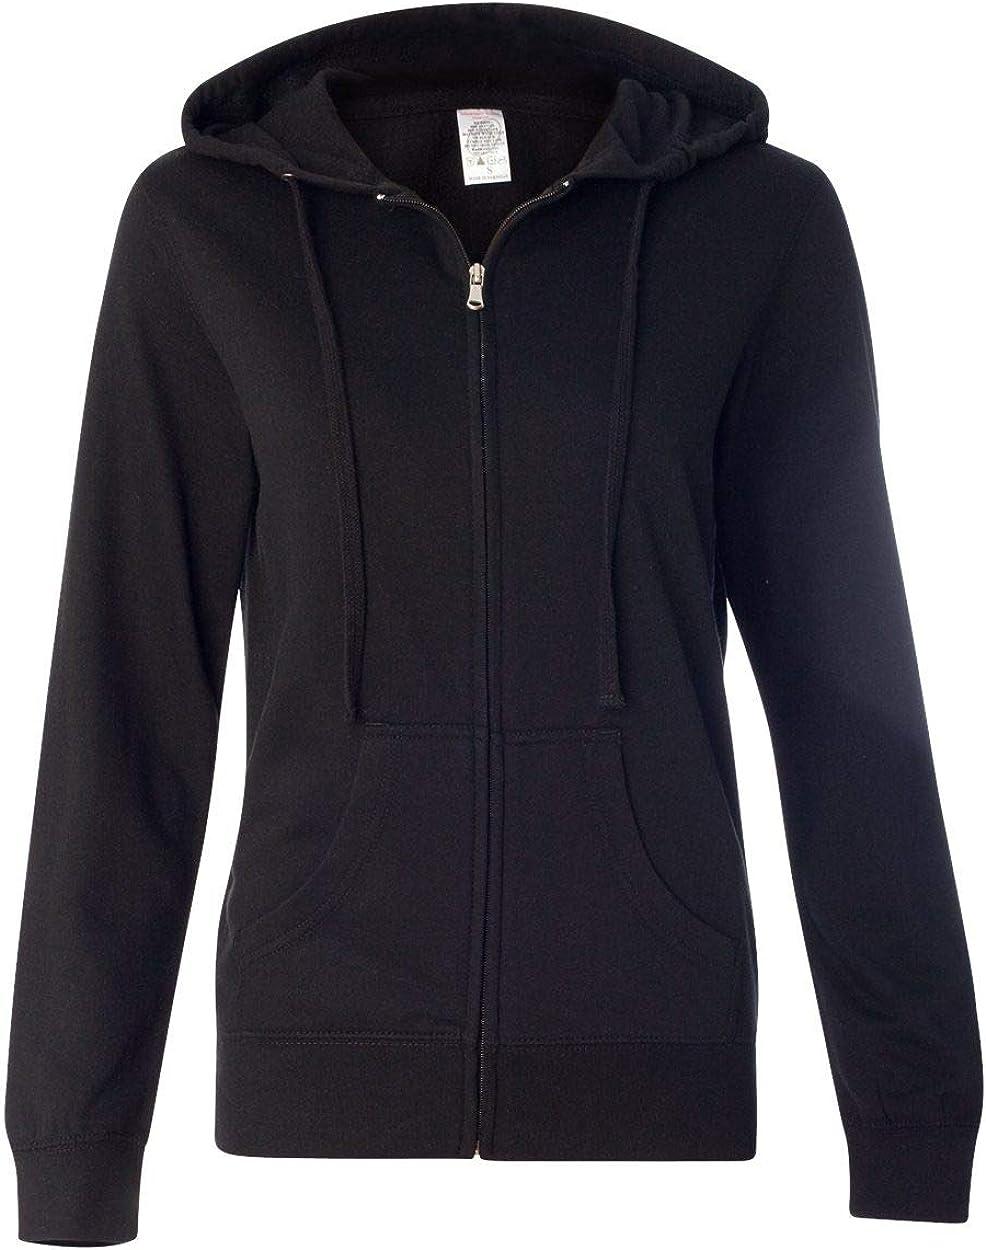 B00HGOTCLG Independent Trading Co ITC Juniors' Heavenly Fleece Sweatshirt SS650Z 6110te6j-fL